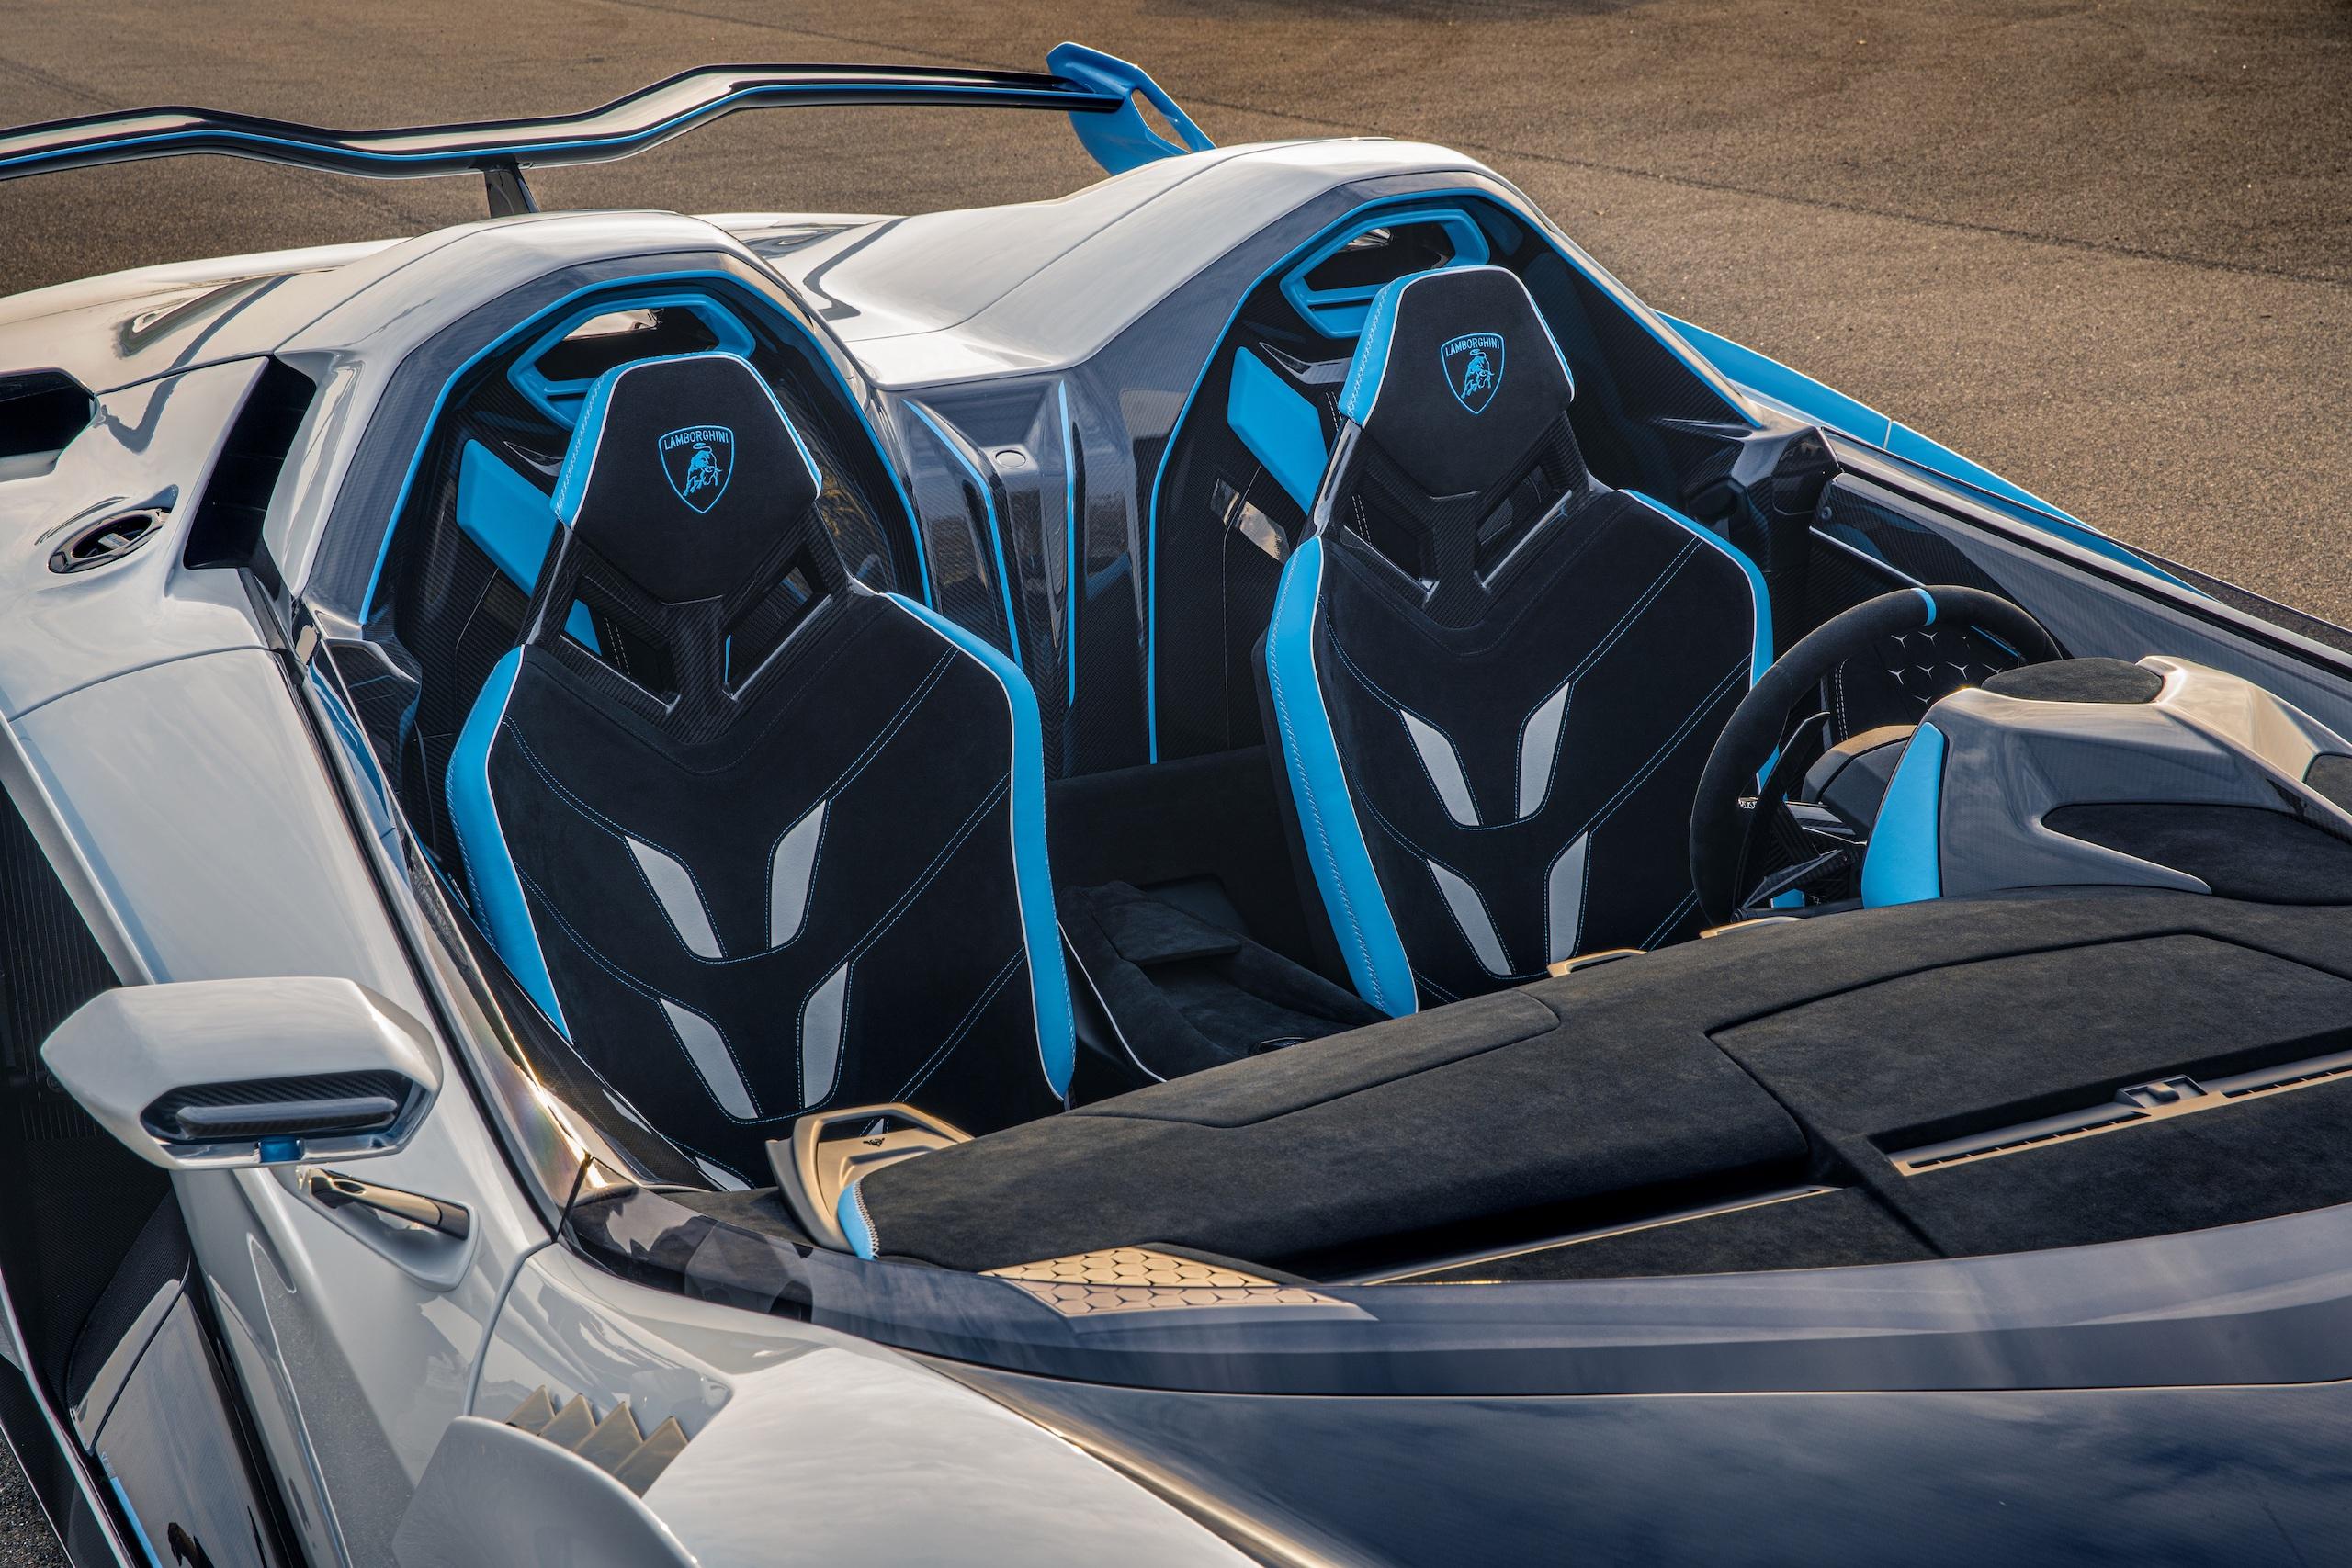 Lamborghini SC20 seat accents